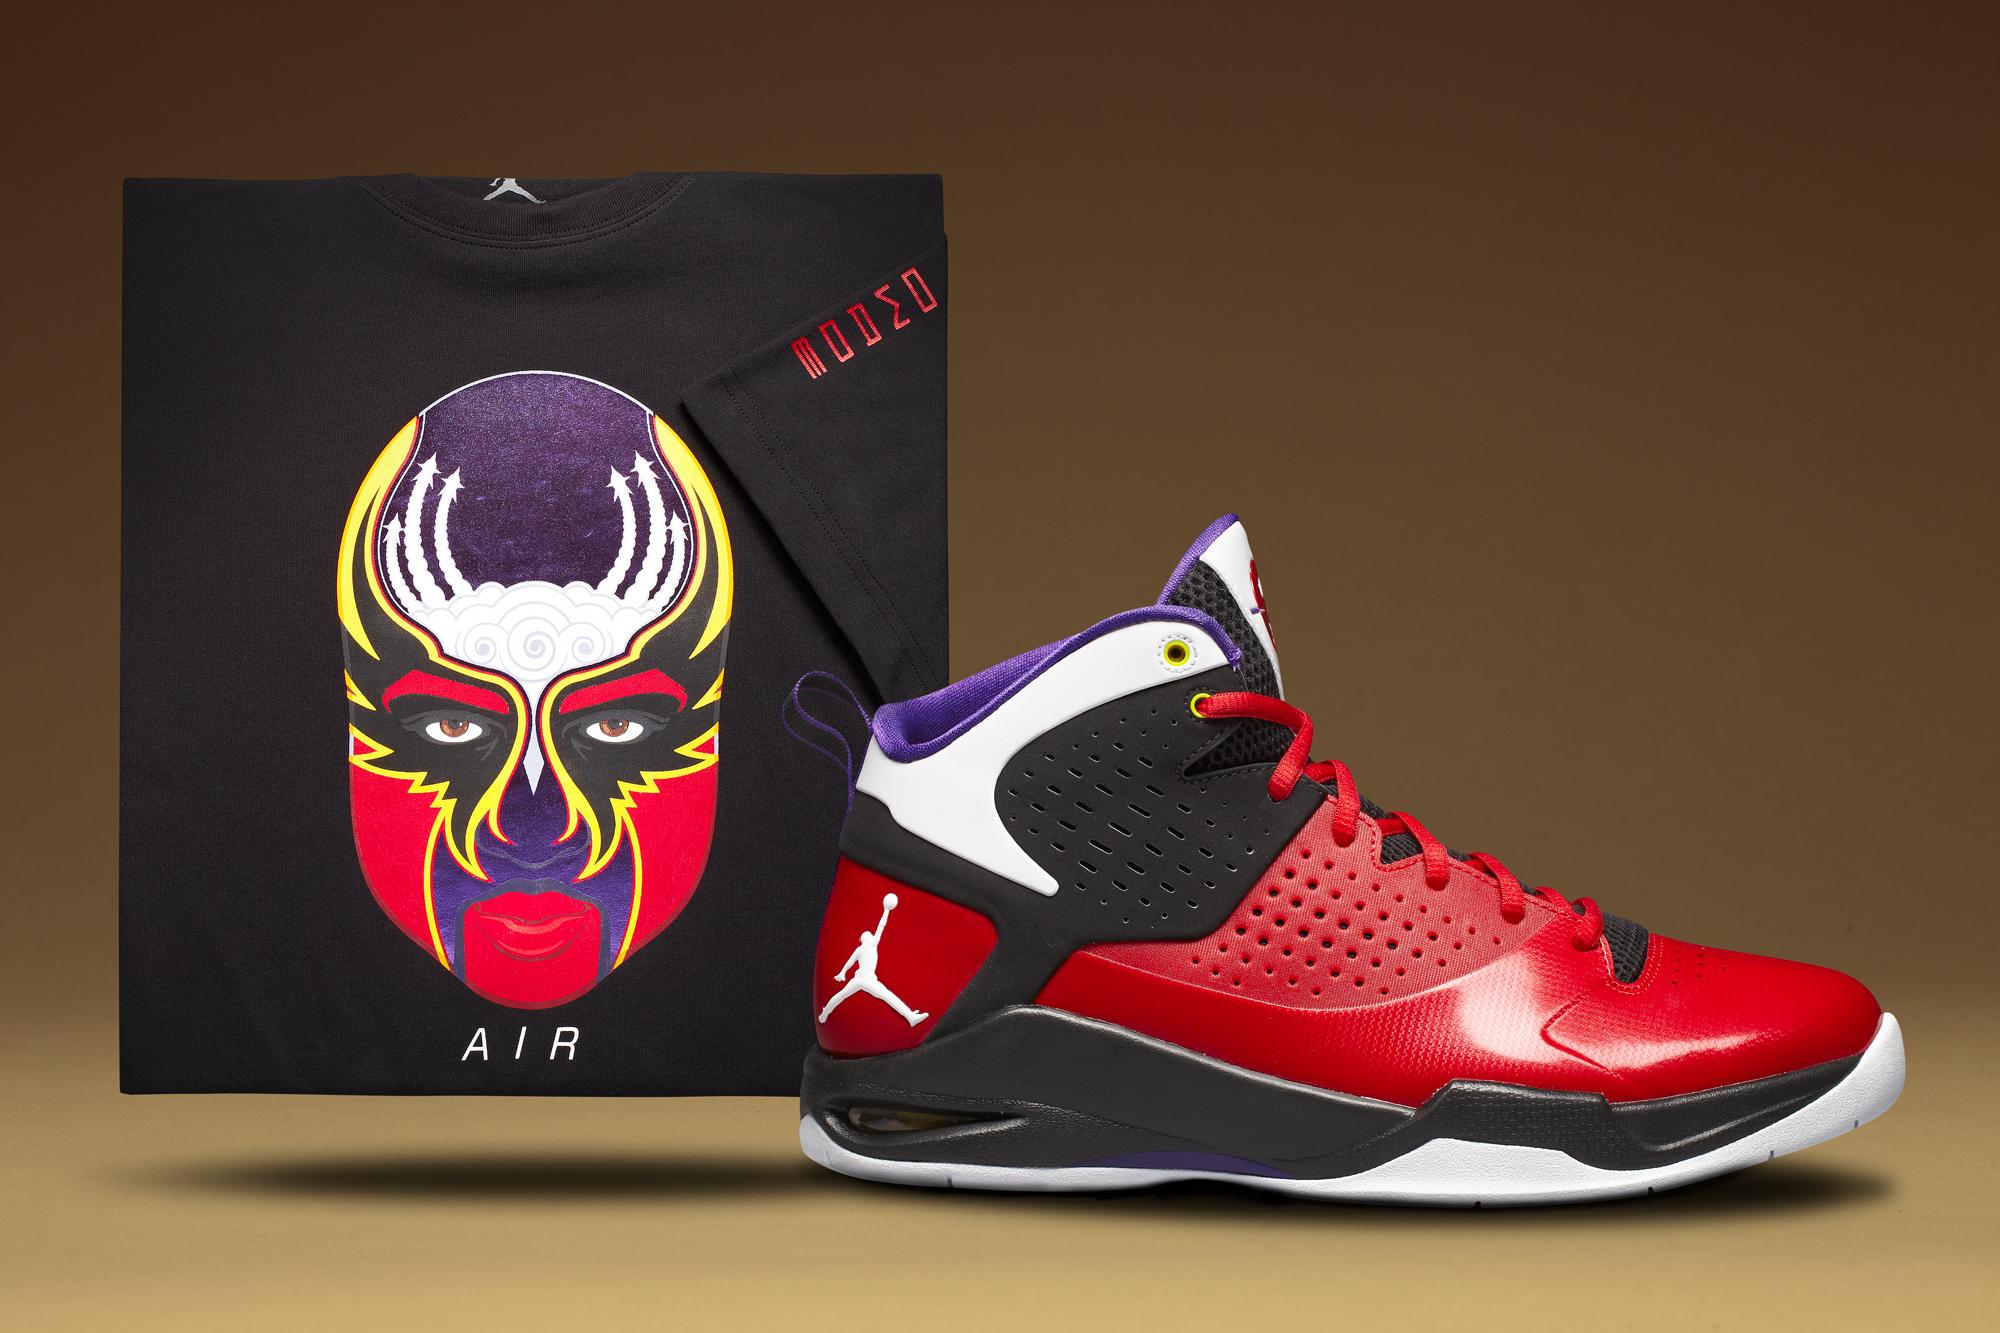 Dwyane Wade - Jordan Fly Wade: Jordan Brand Flight Tour China - Air Jordans,  Release Dates & More | JordansDaily.com